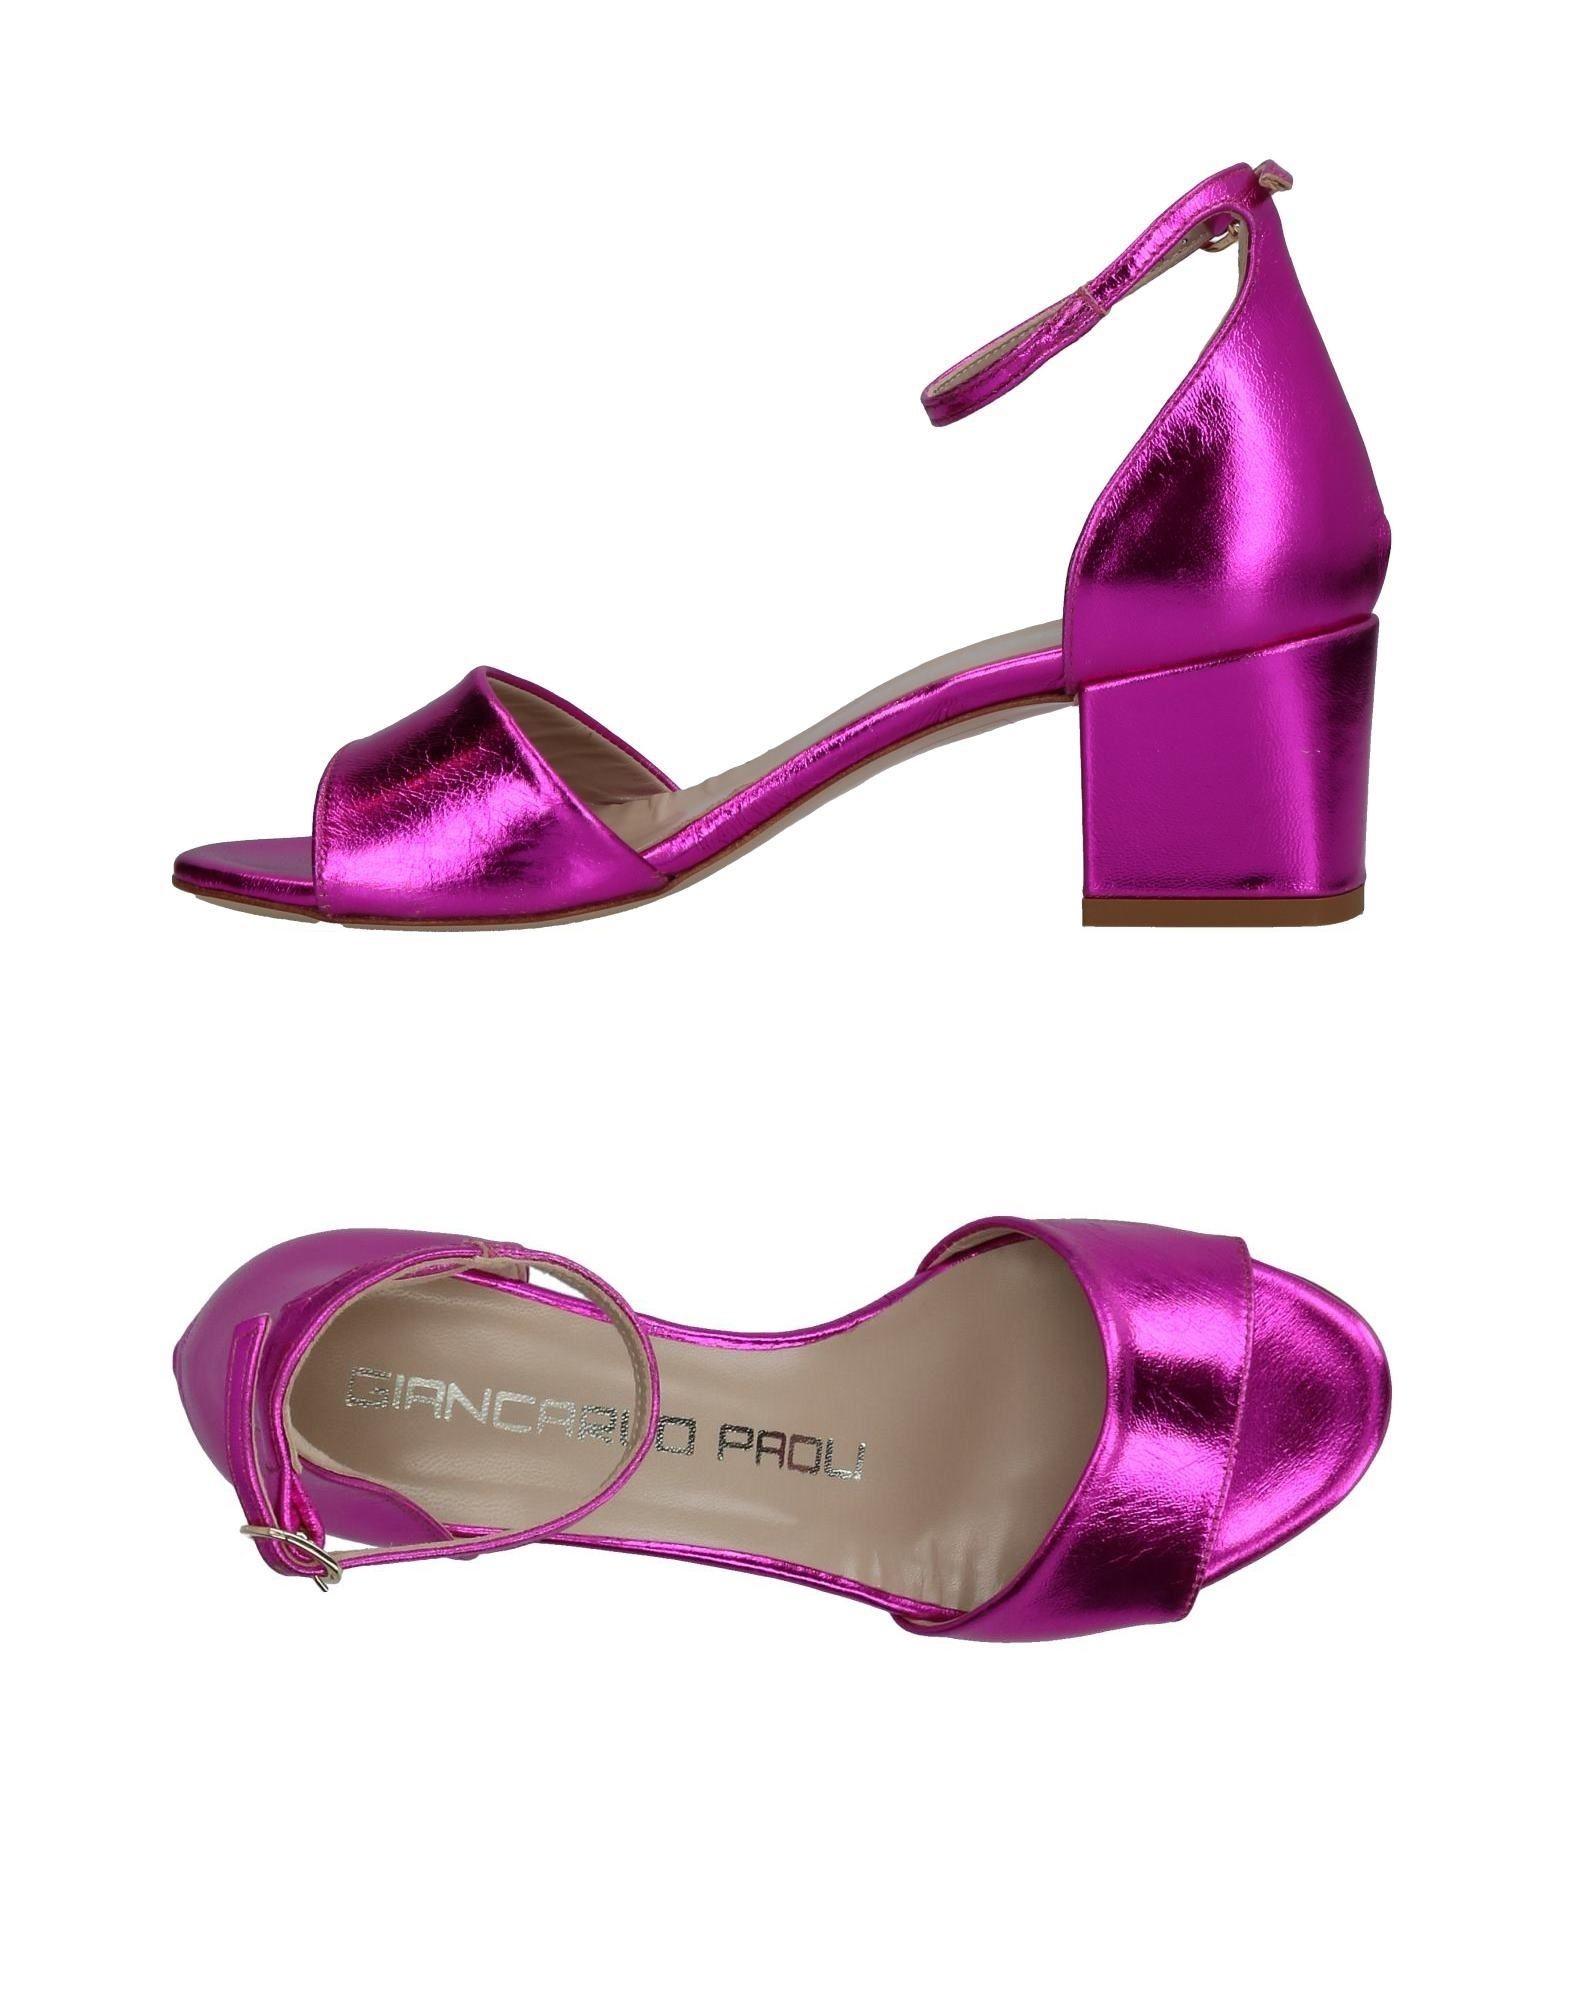 Giancarlo Paoli Sandalen Damen  11339093AL Gute Qualität beliebte Schuhe